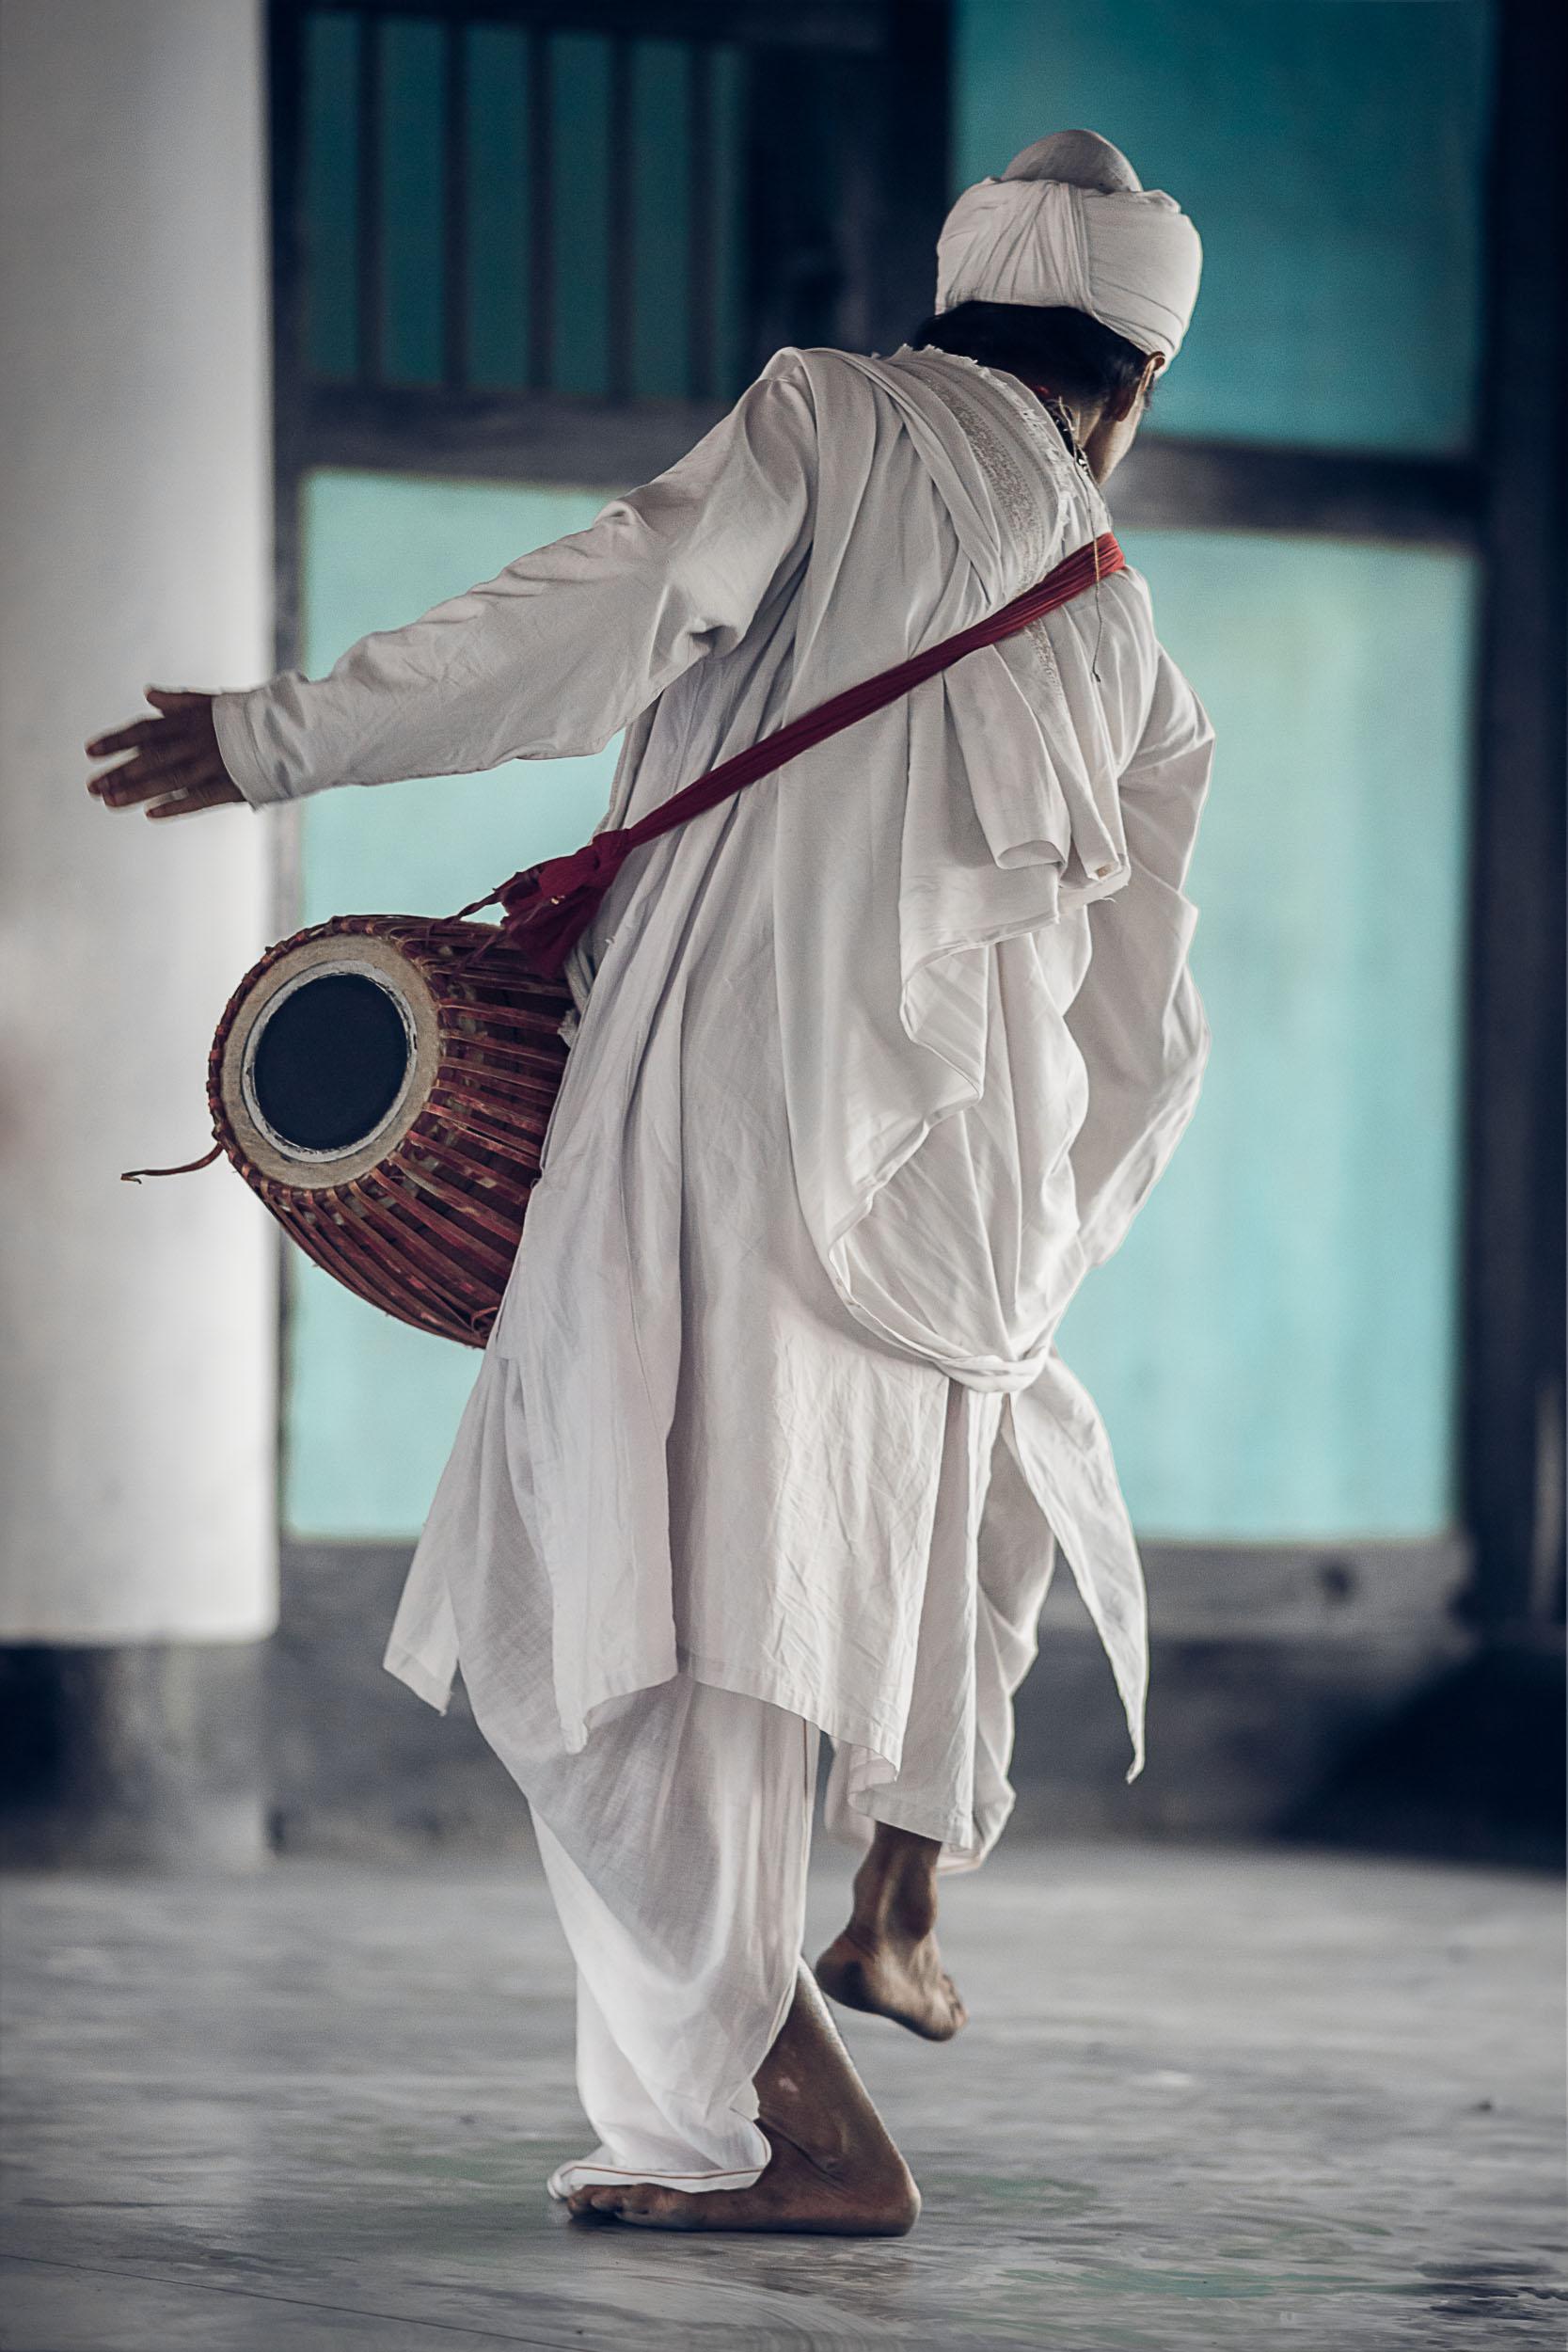 Sindhur_Photography_Travel_People_Majuli-29.JPG